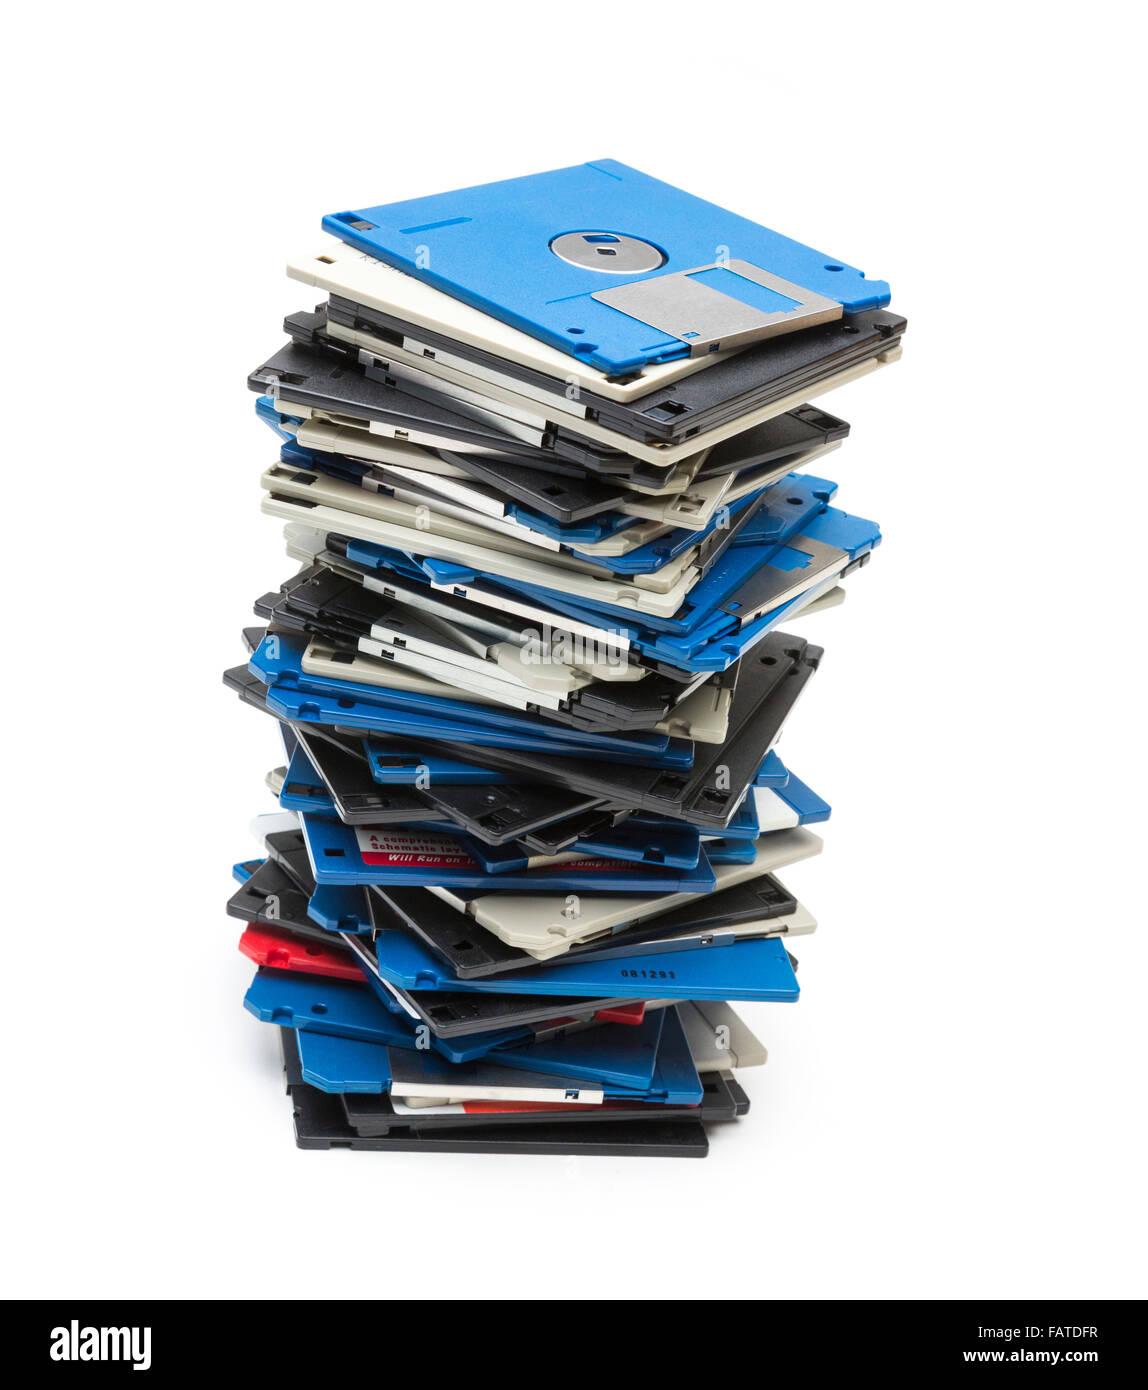 obsolete 3.5' floppy disks - Stock Image